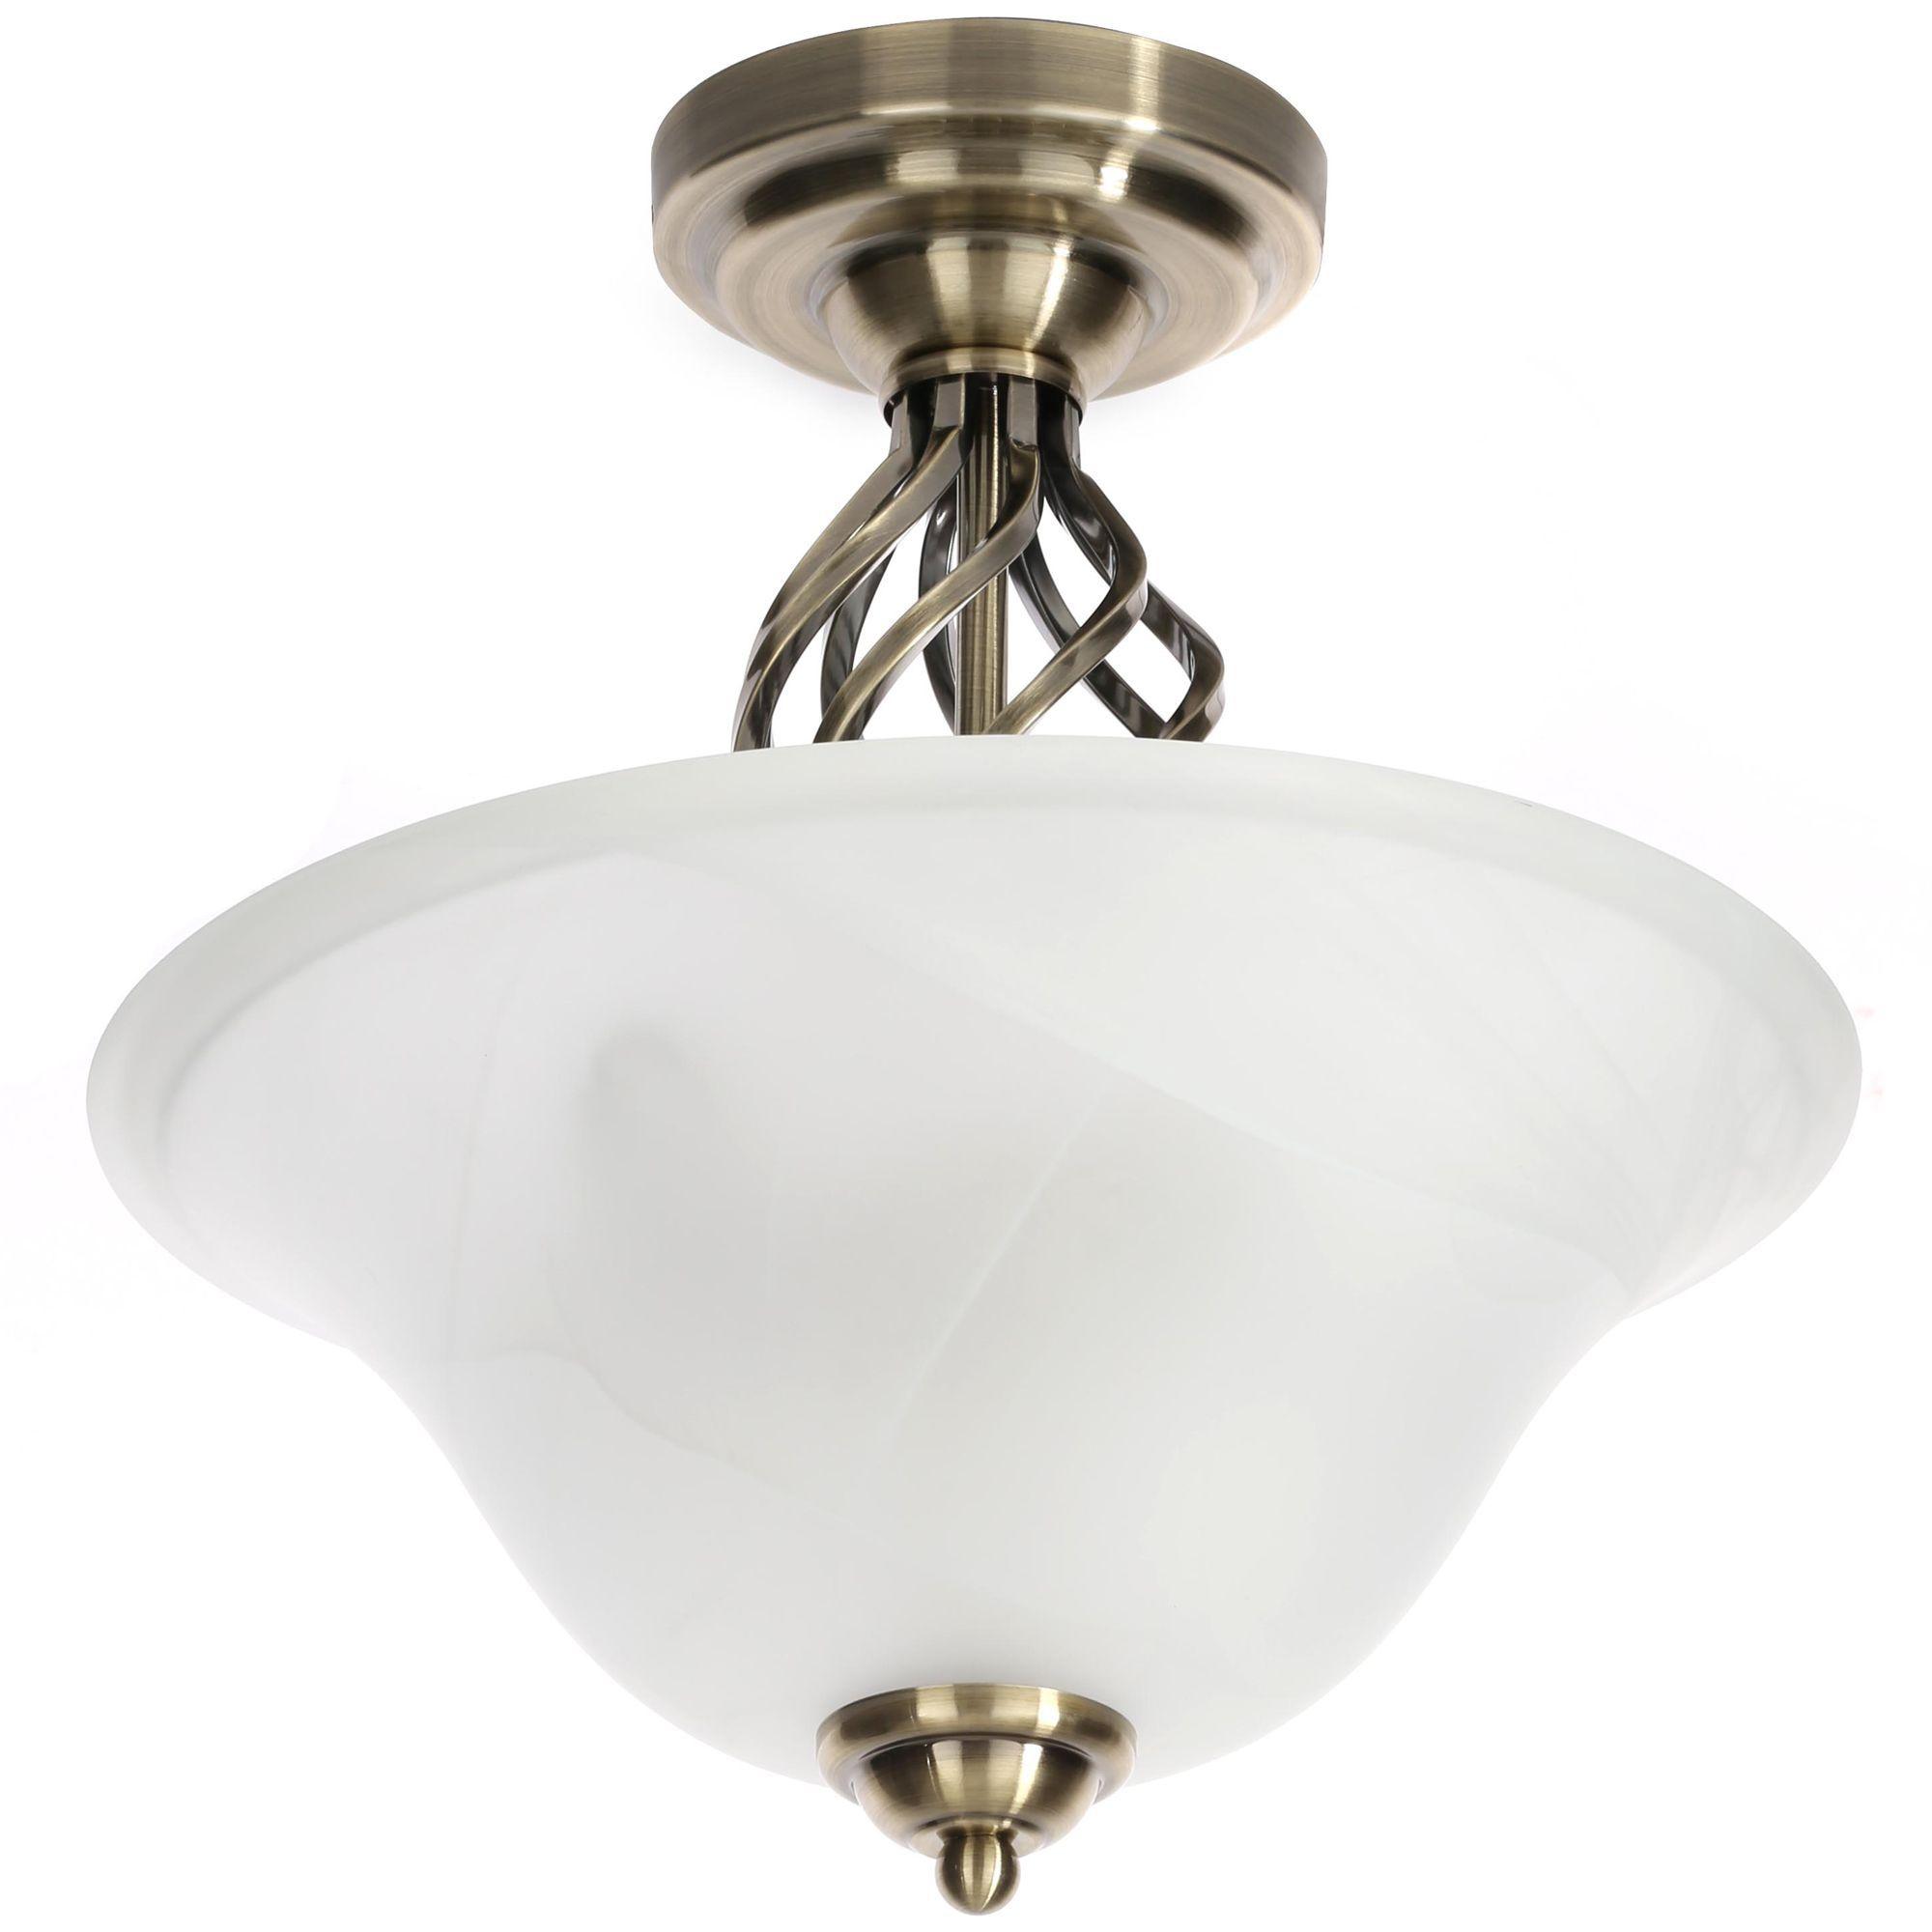 Rolli Antique Brass Effect Flush Ceiling Light Departments Diy At B Q